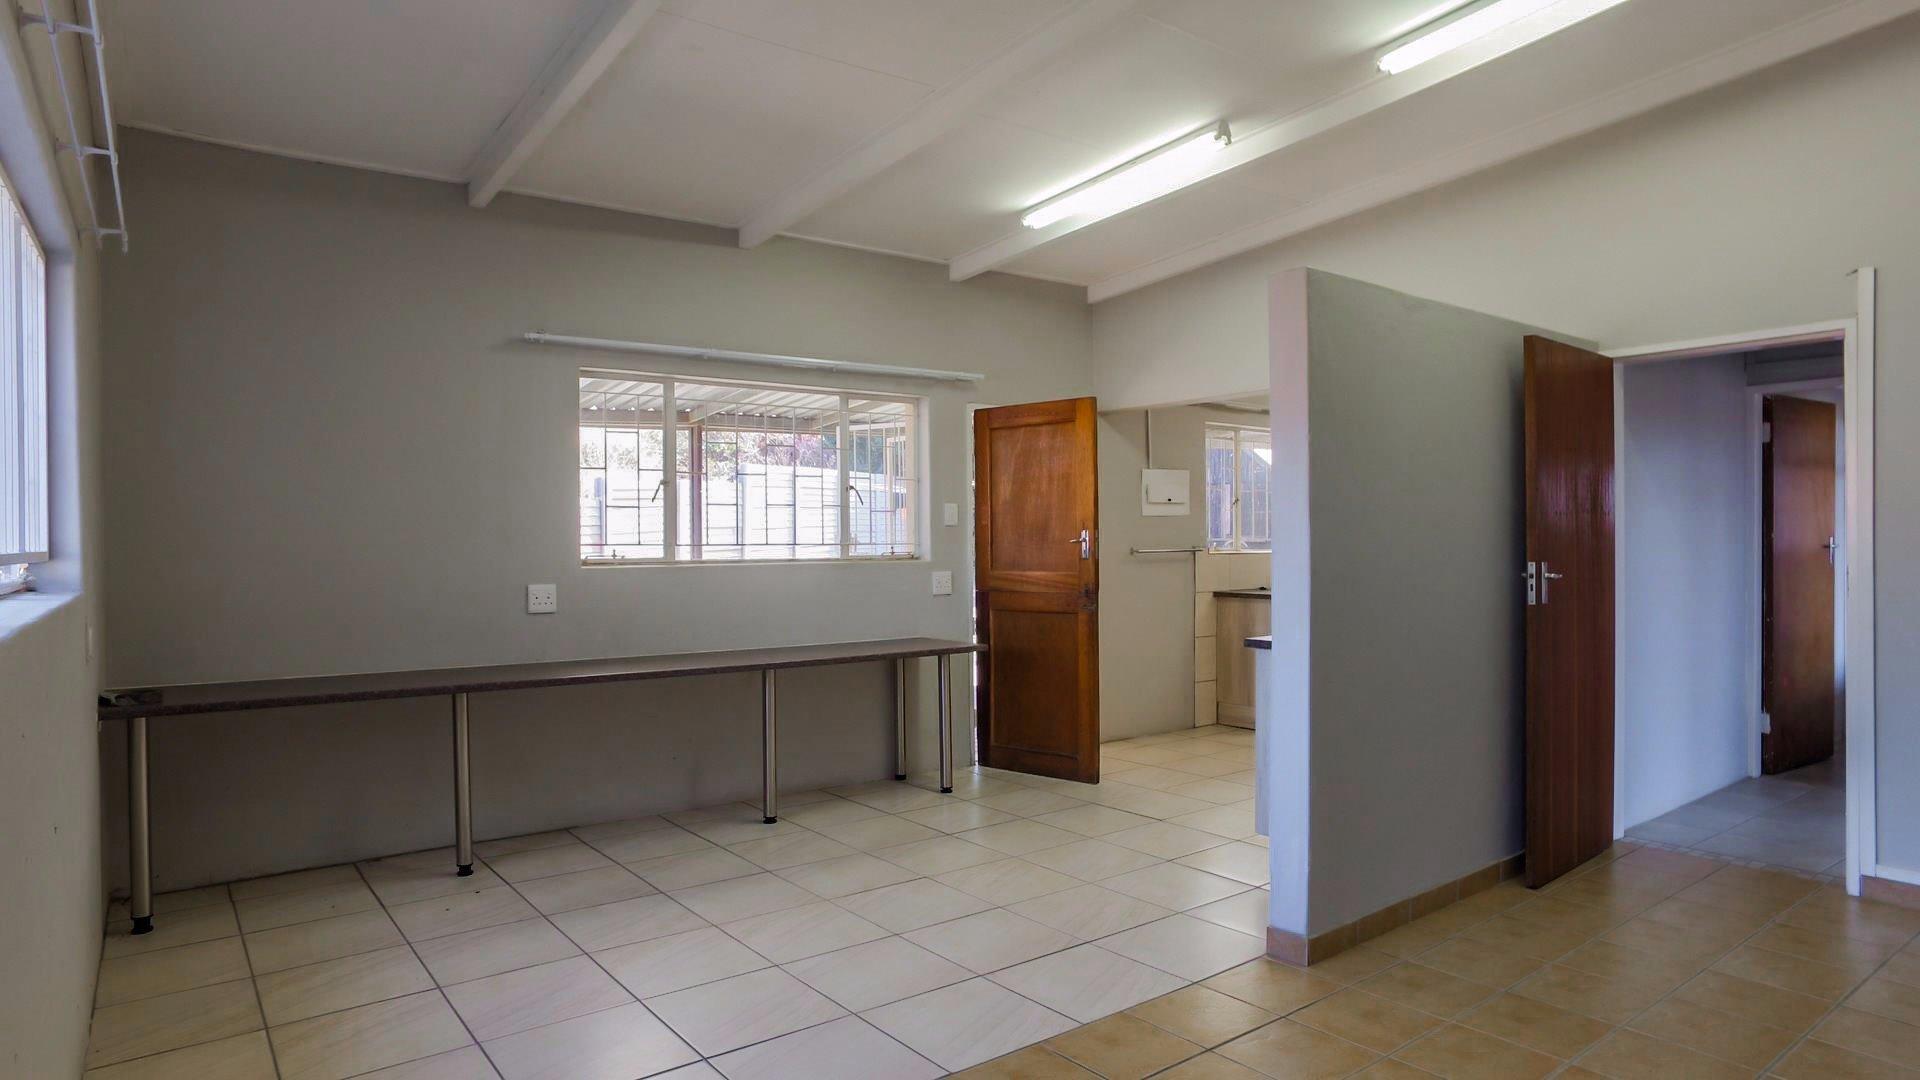 Erasmia property for sale. Ref No: 13379466. Picture no 11